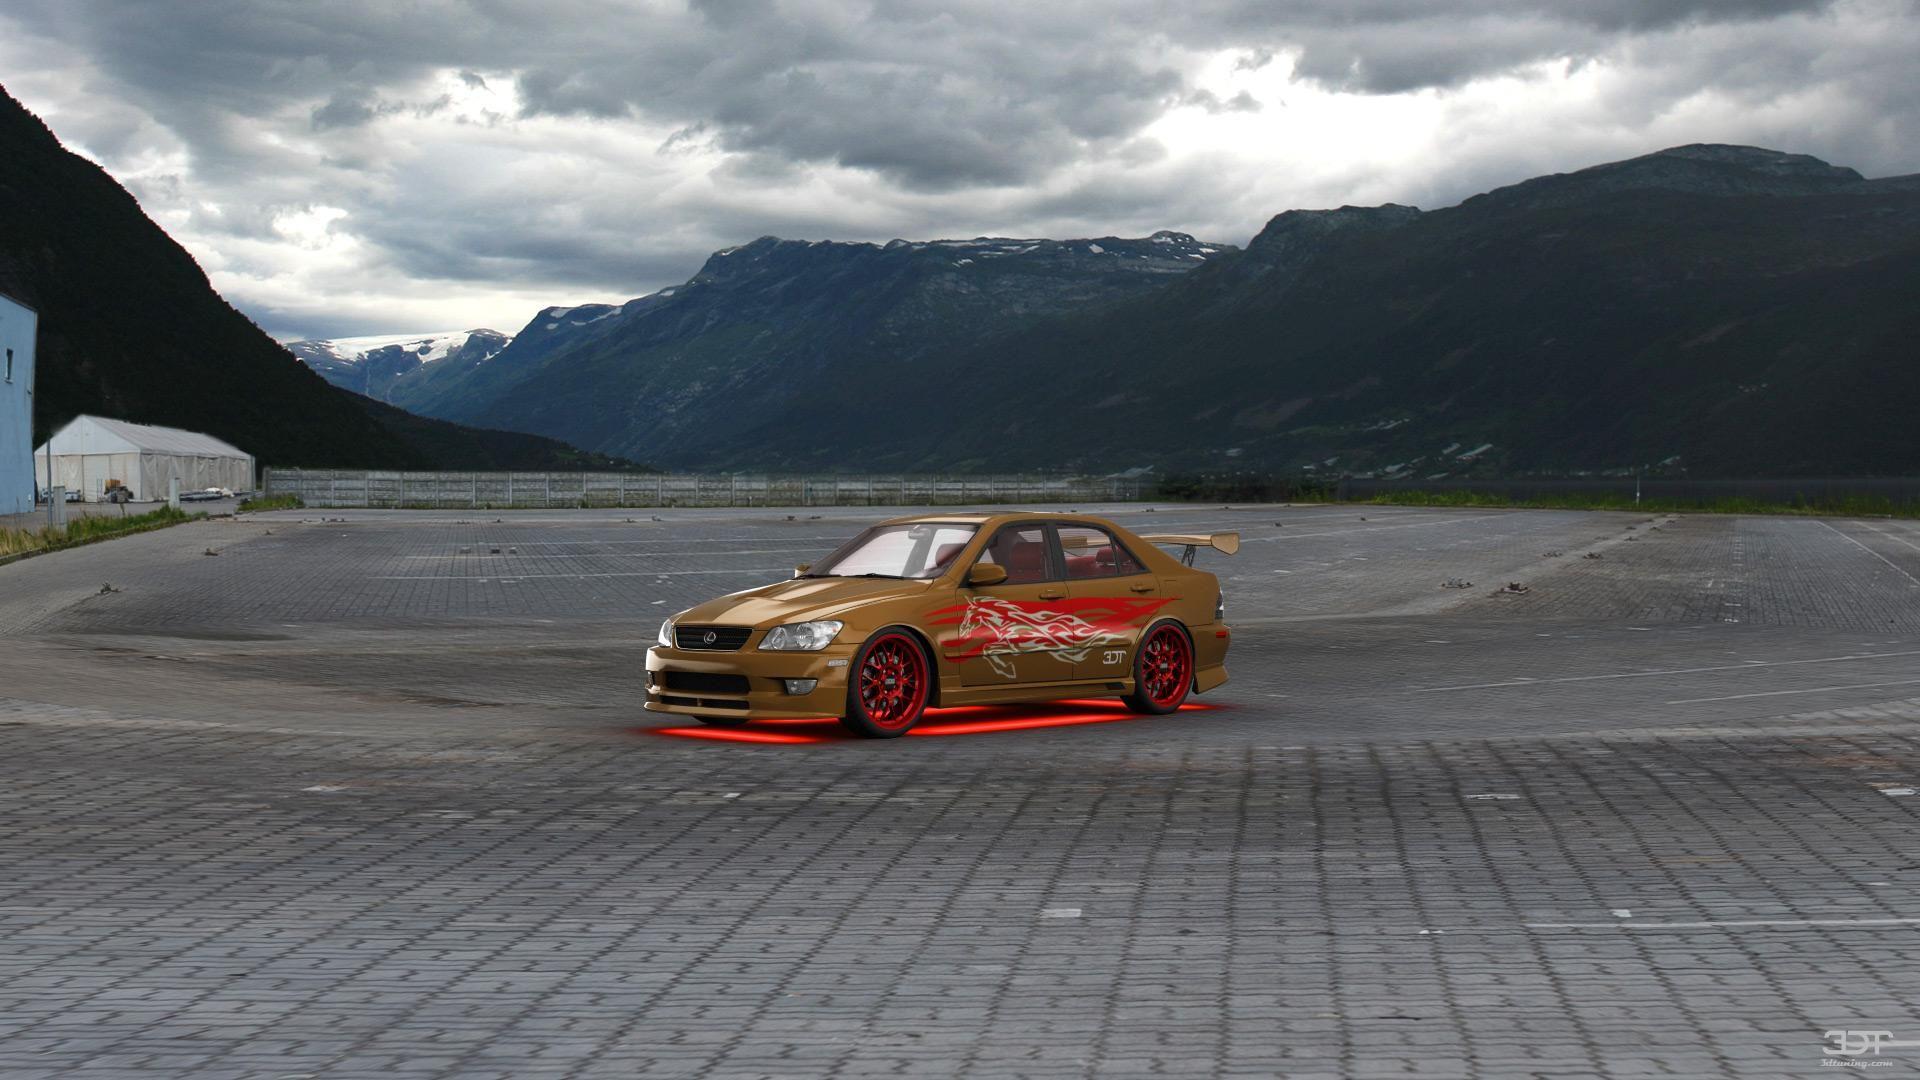 Checkout My Tuning Lexus Is 2003 At 3dtuning 3dtuning Tuning Tuning Honda Rx 8